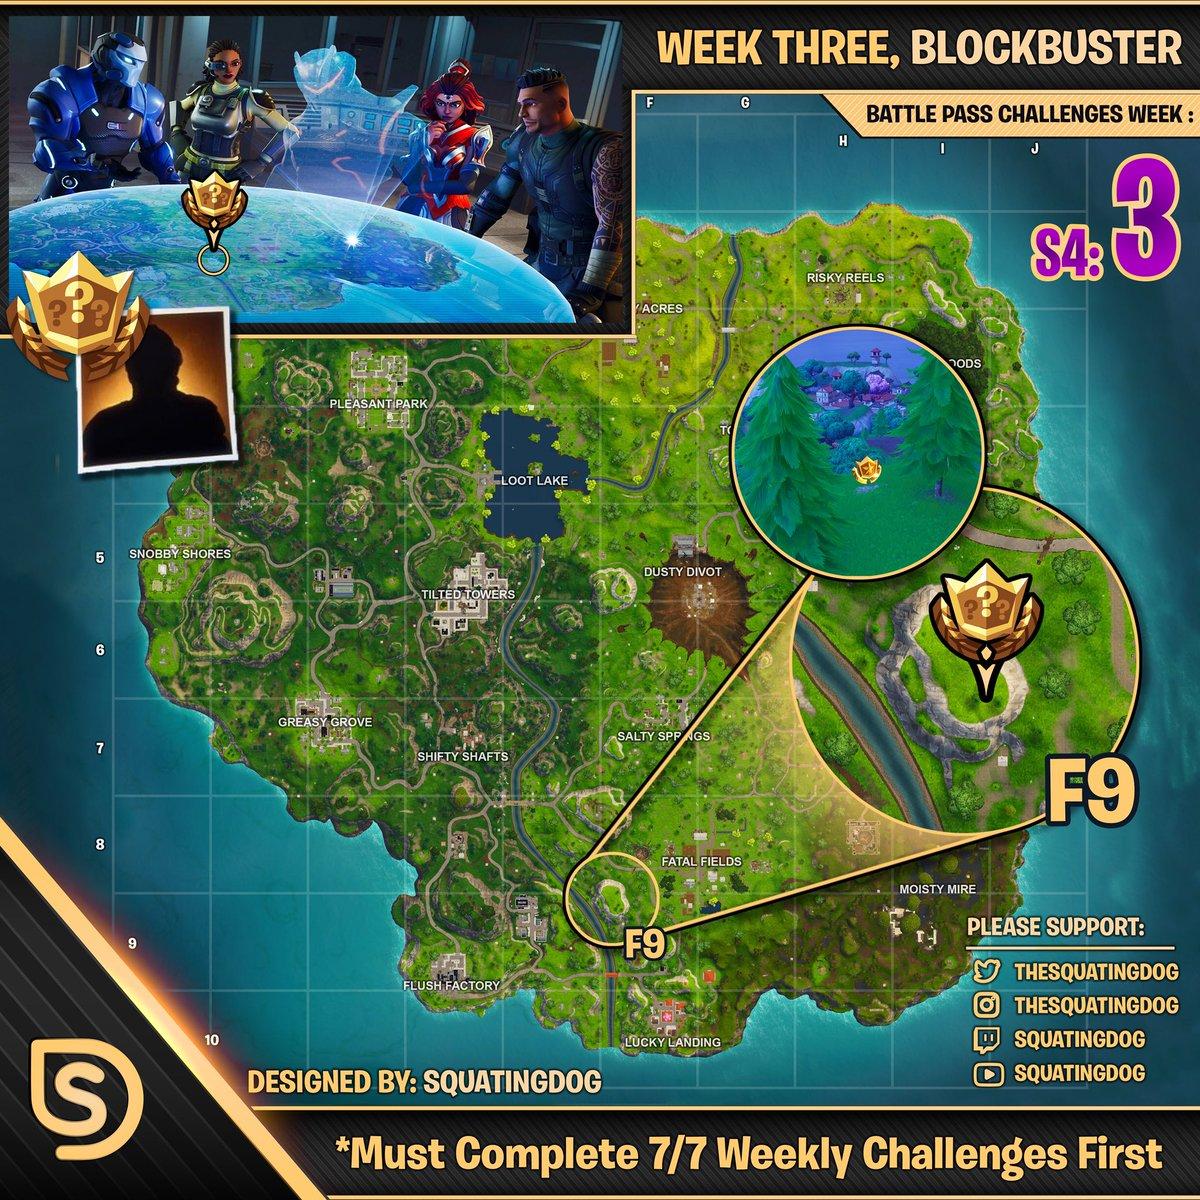 squatingdog - week 3 challenges fortnite season 4